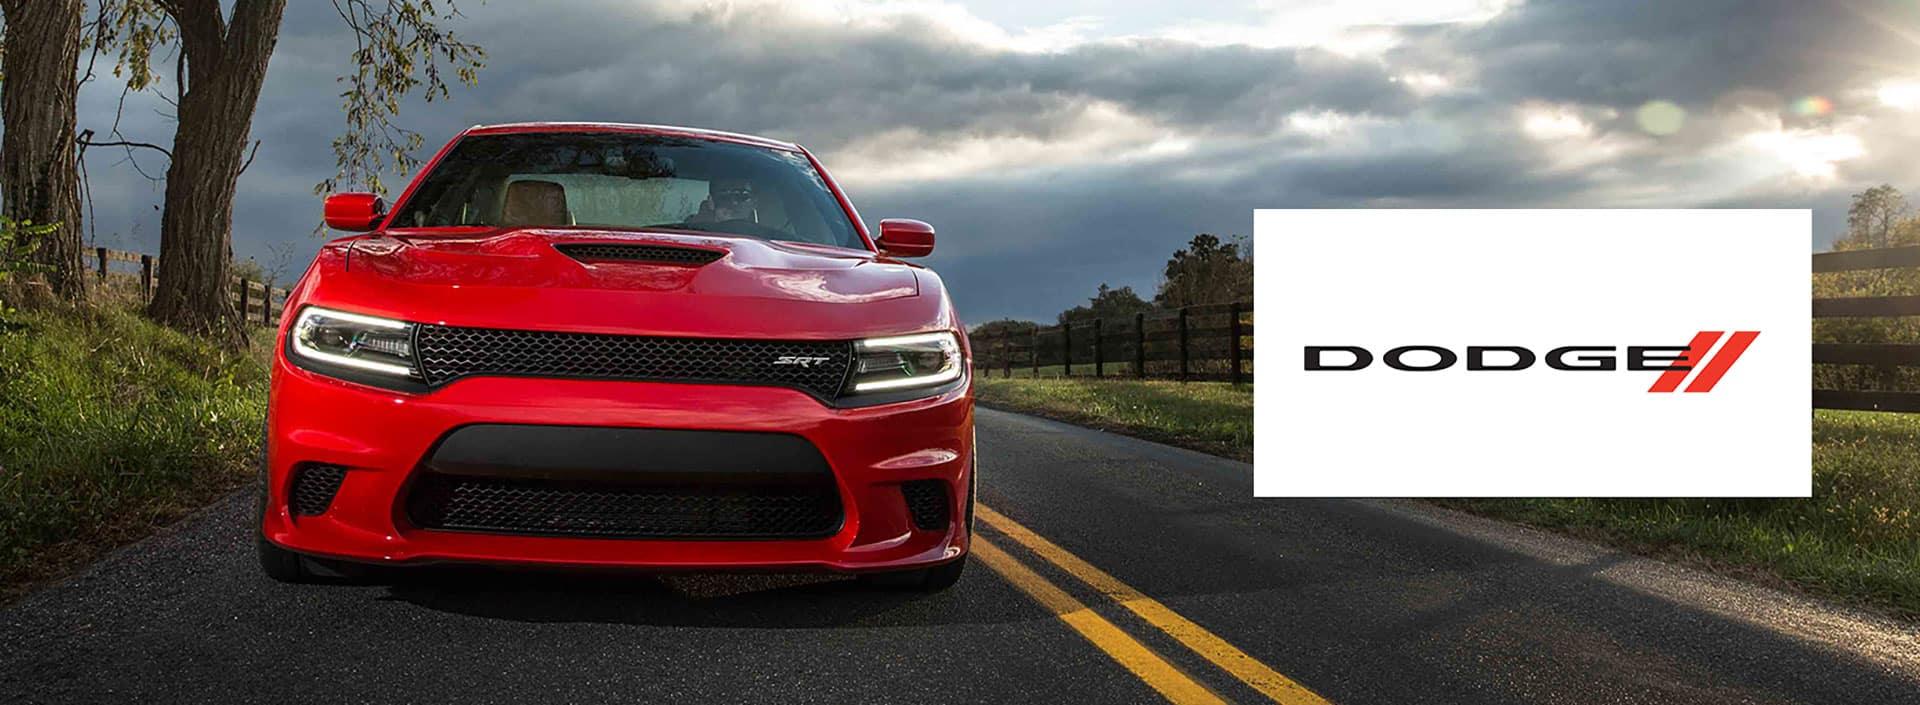 Dodge-banner